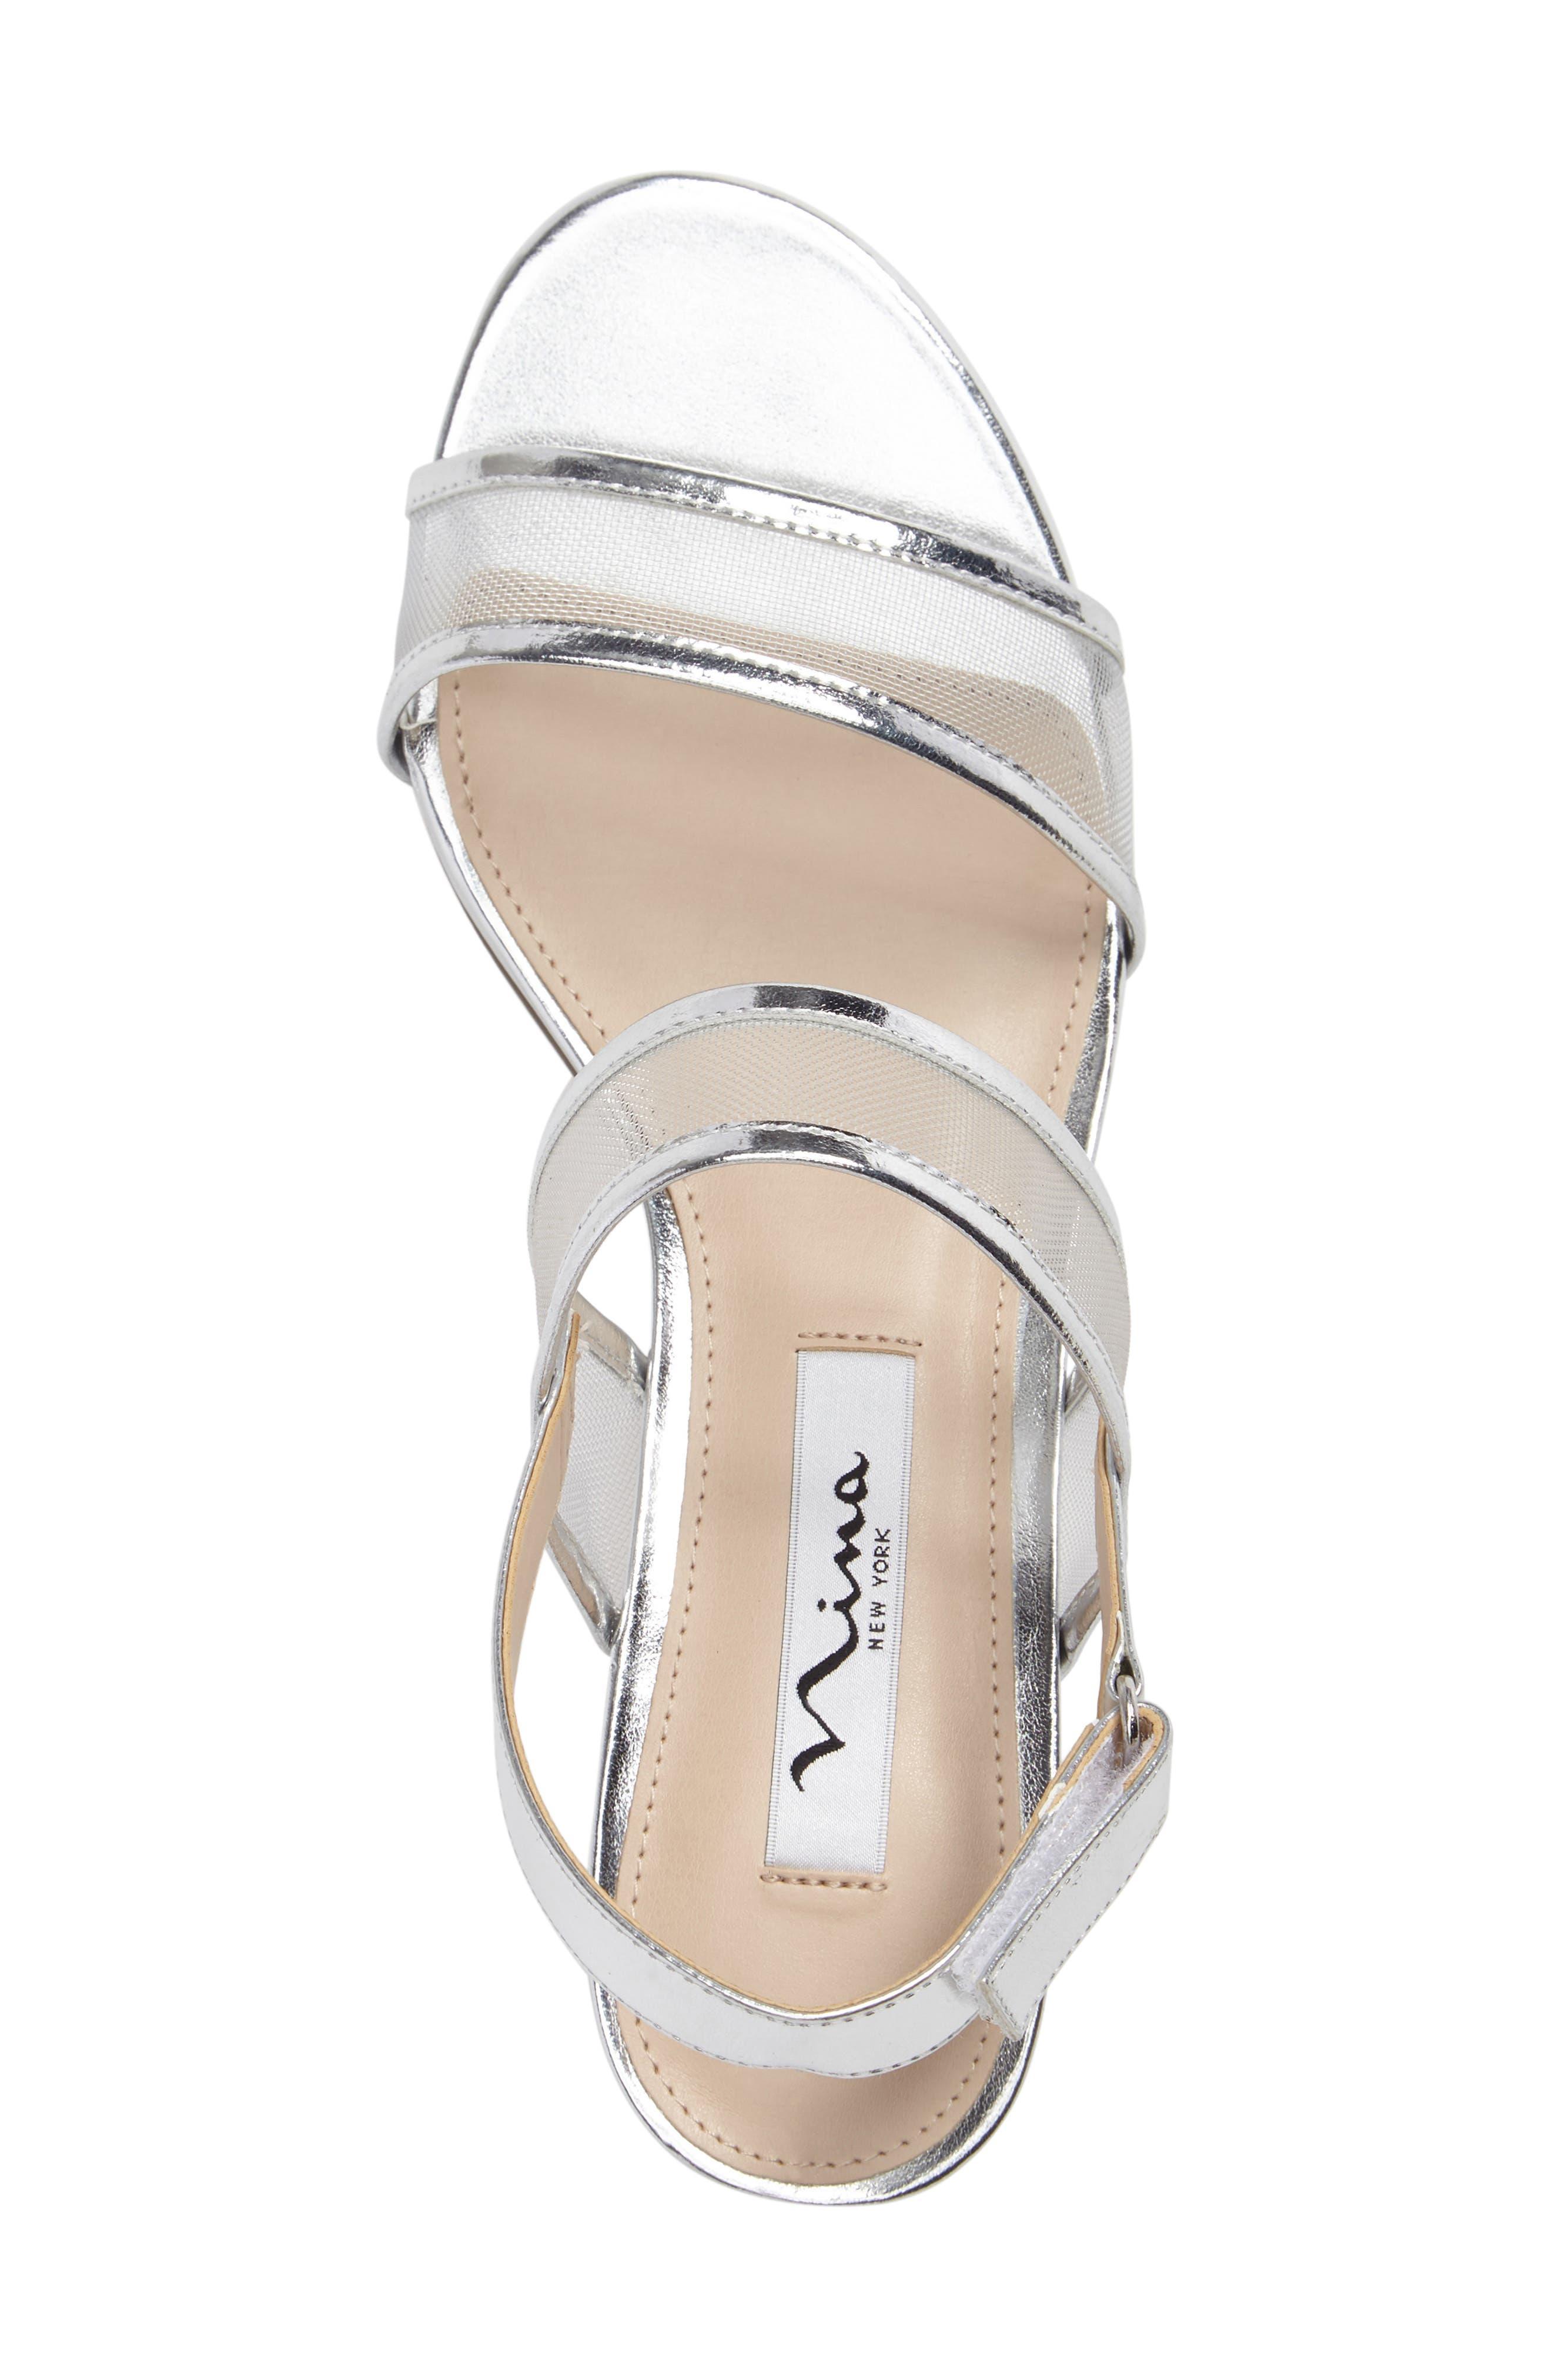 Ganice Mesh Strap Sandal,                             Alternate thumbnail 3, color,                             Silver Faux Leather